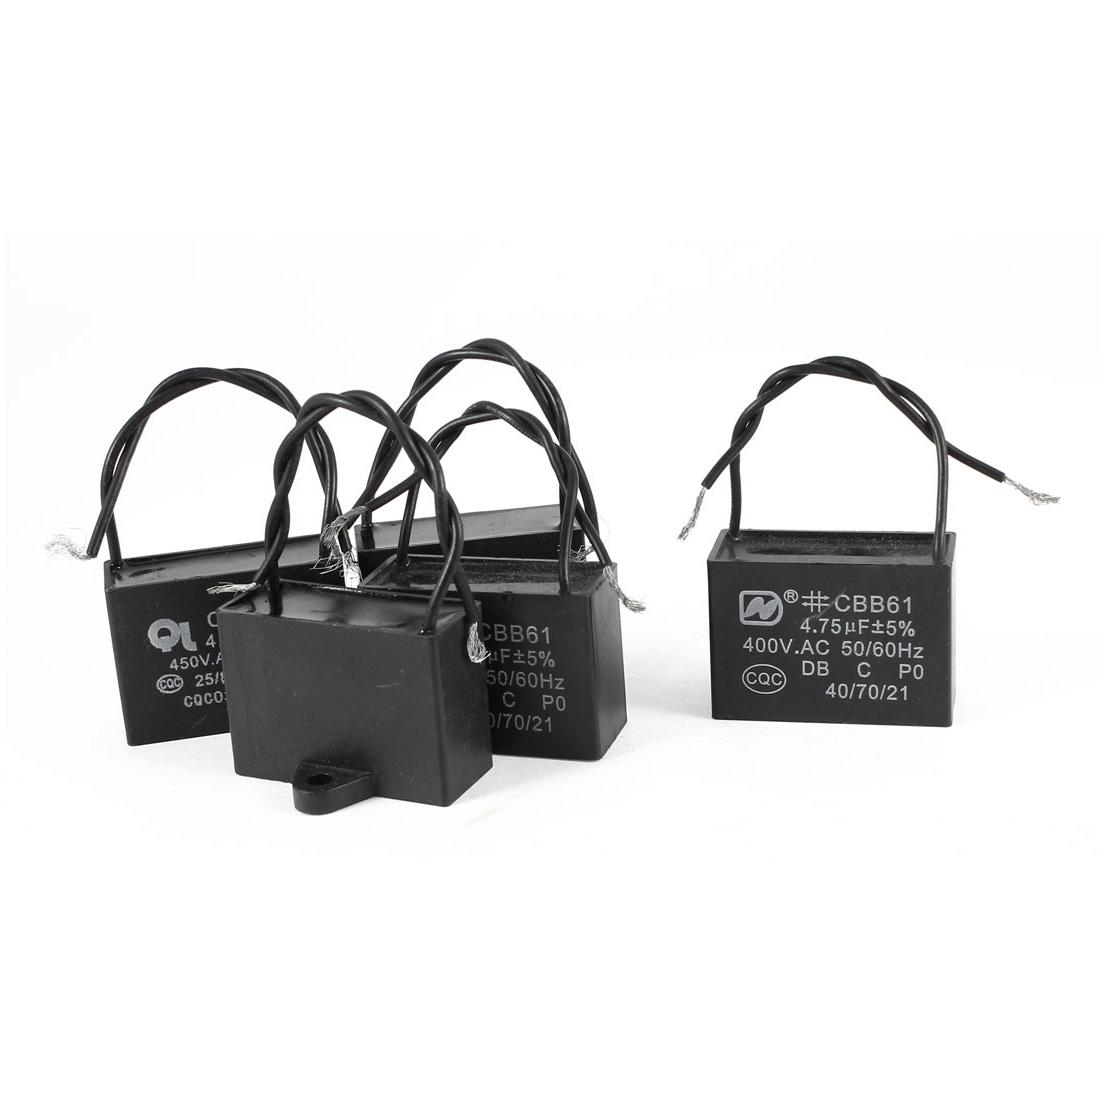 5 Pcs AC 450V 4.75uF 5% 2 Wired Metalized Polypropylene Film Motor Capacitor Black